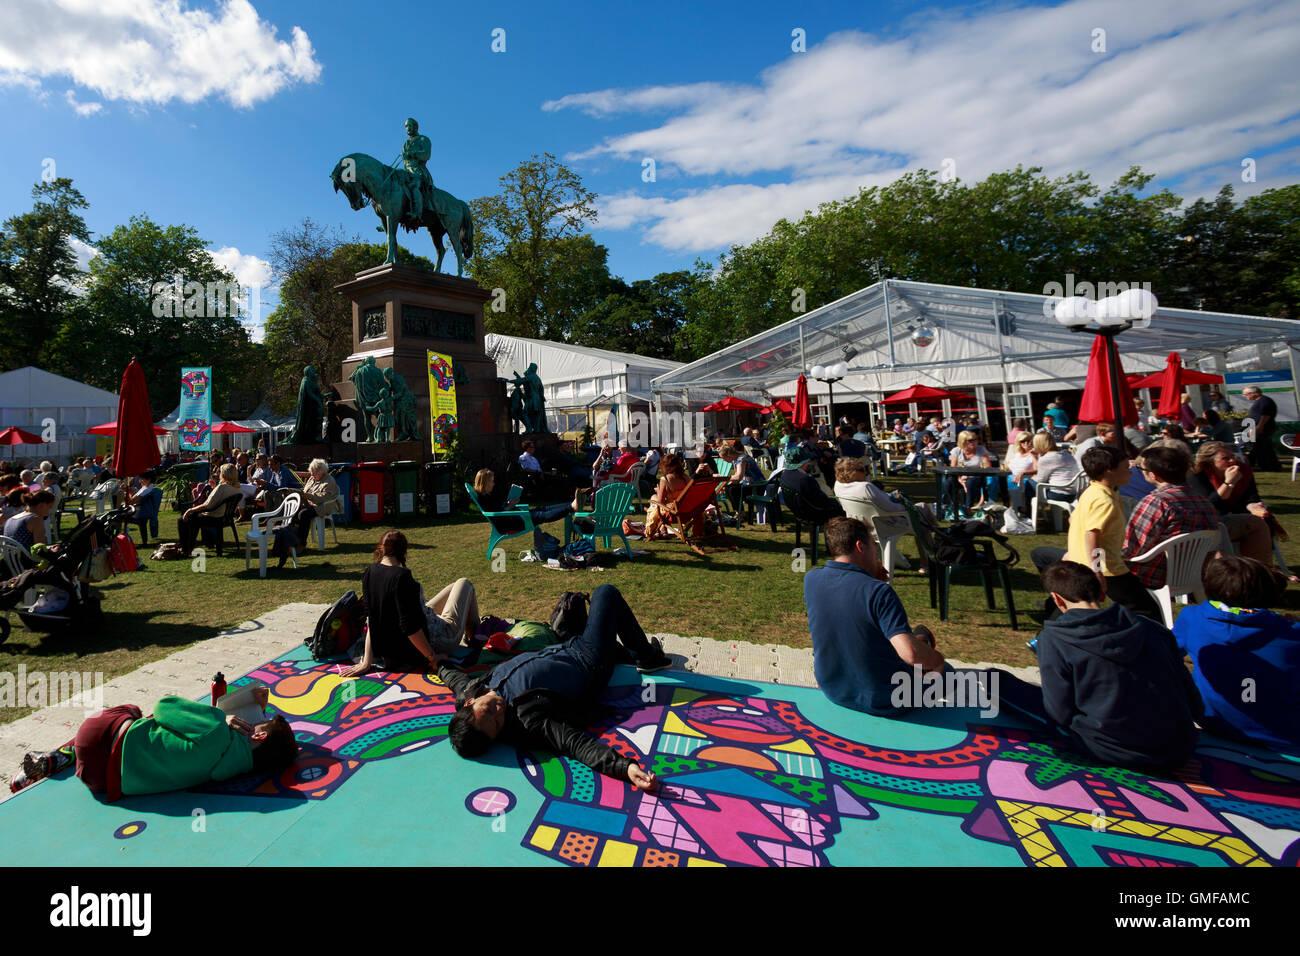 Edinburgh, UK. 26th August 2016. Edinburgh International Book Festival Sunny day in Charlotte Square Gardens. Pako - Stock Image